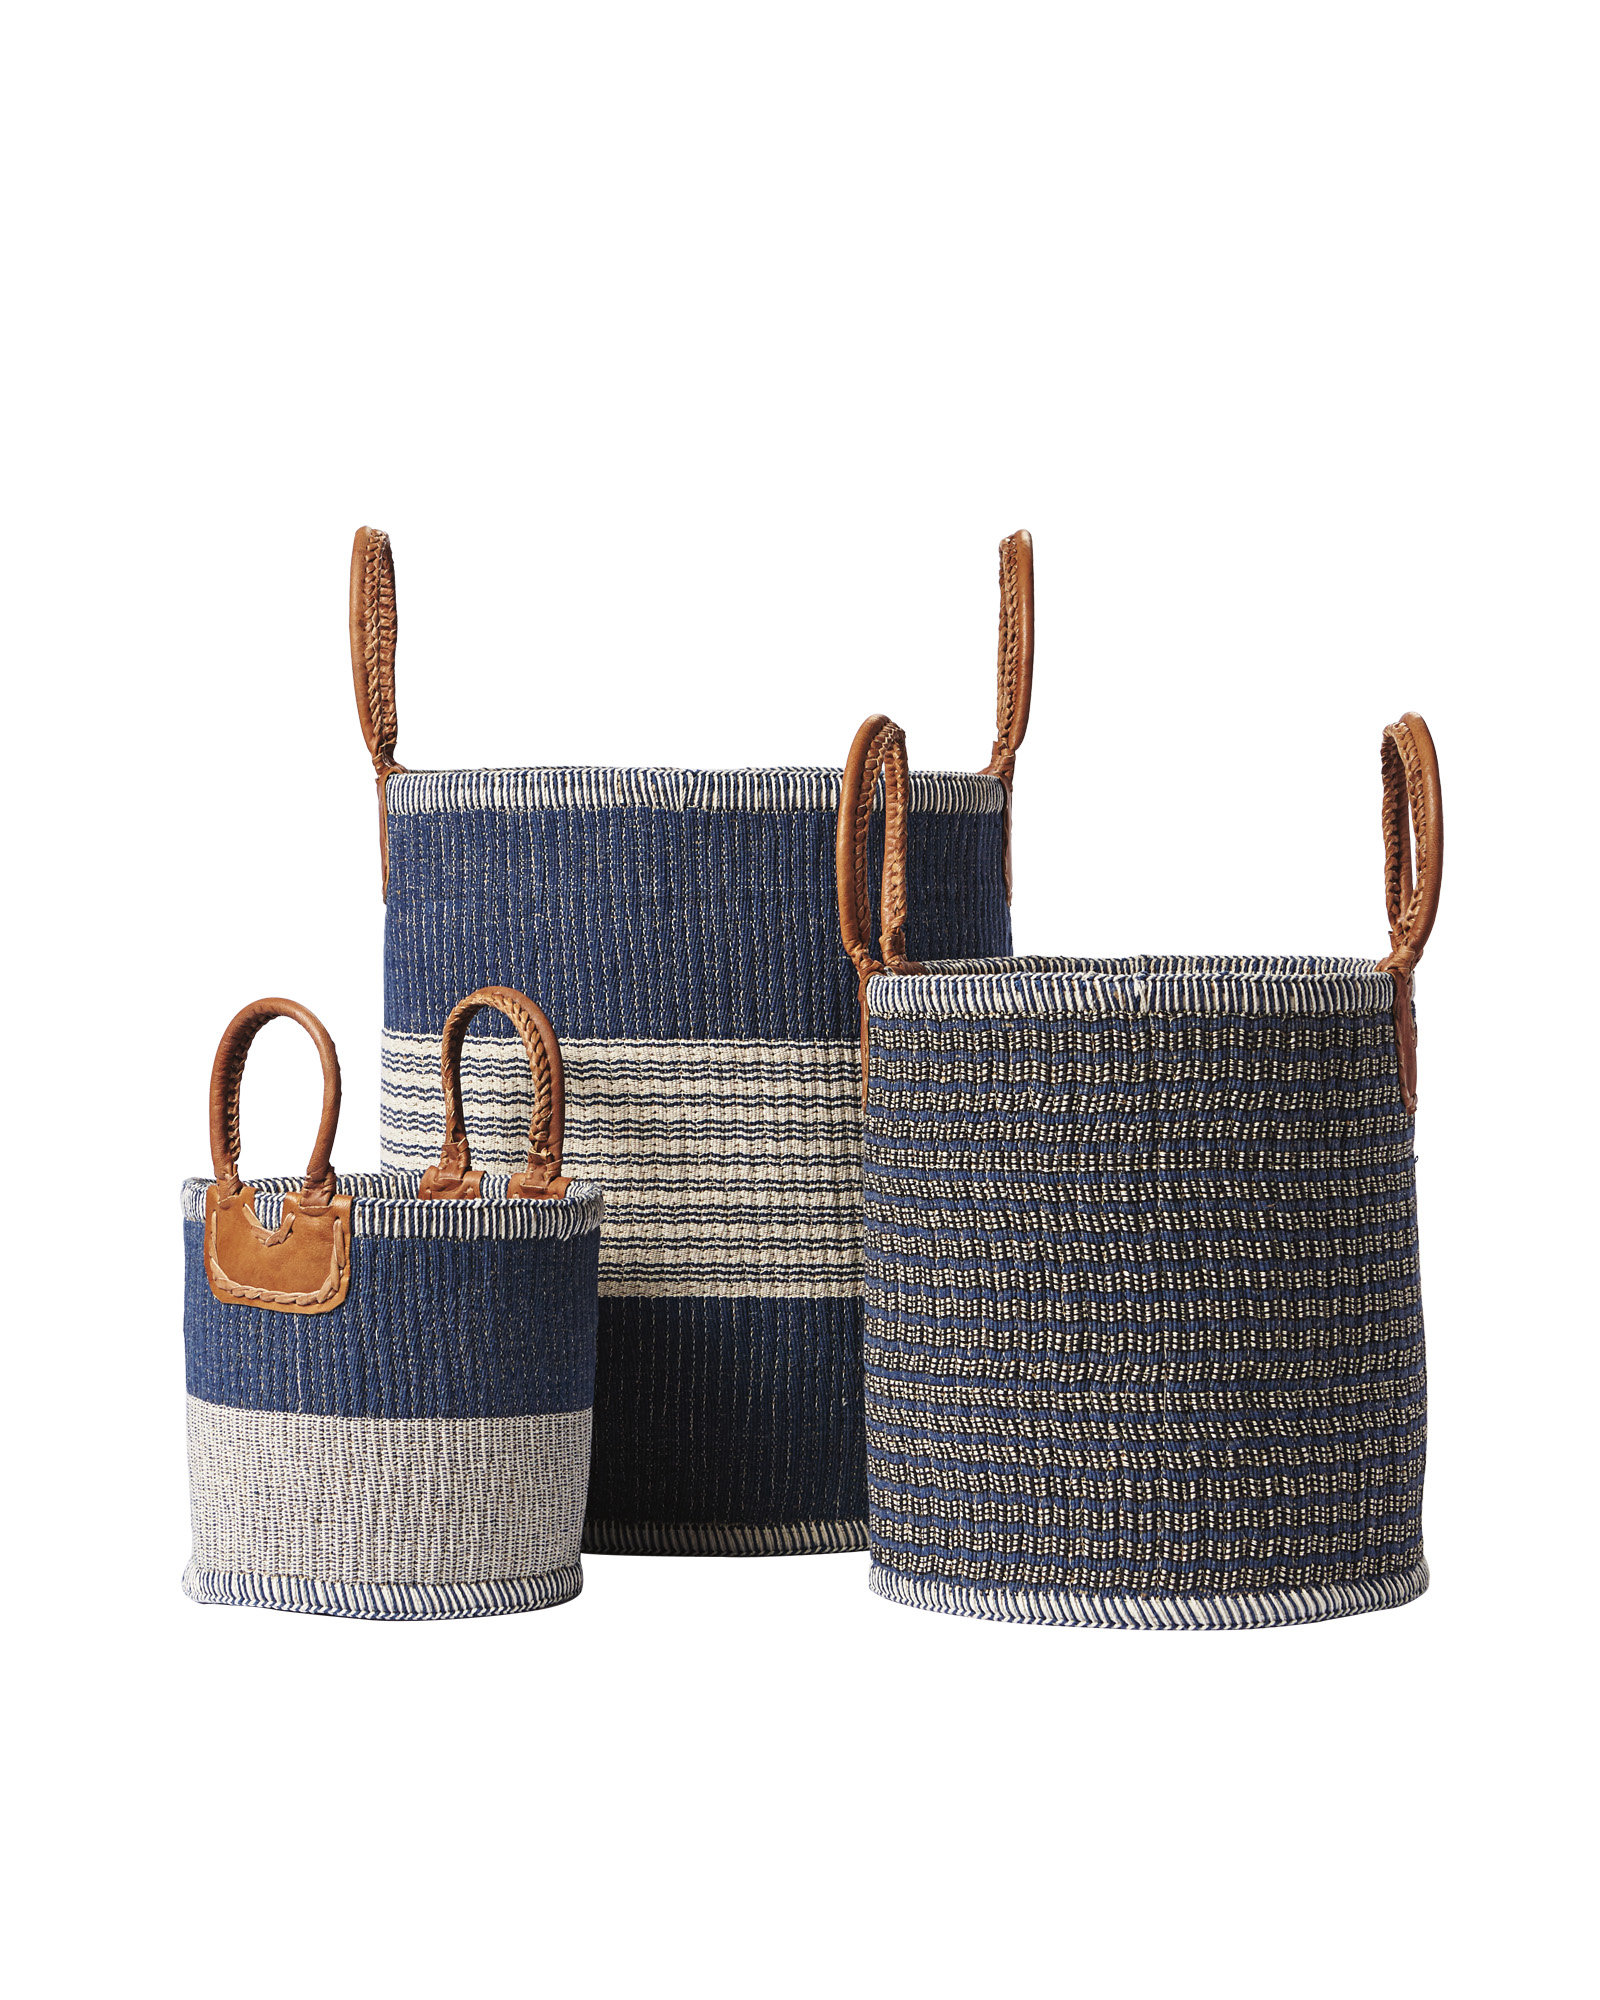 Hungting Baskets - Indigo .jpg